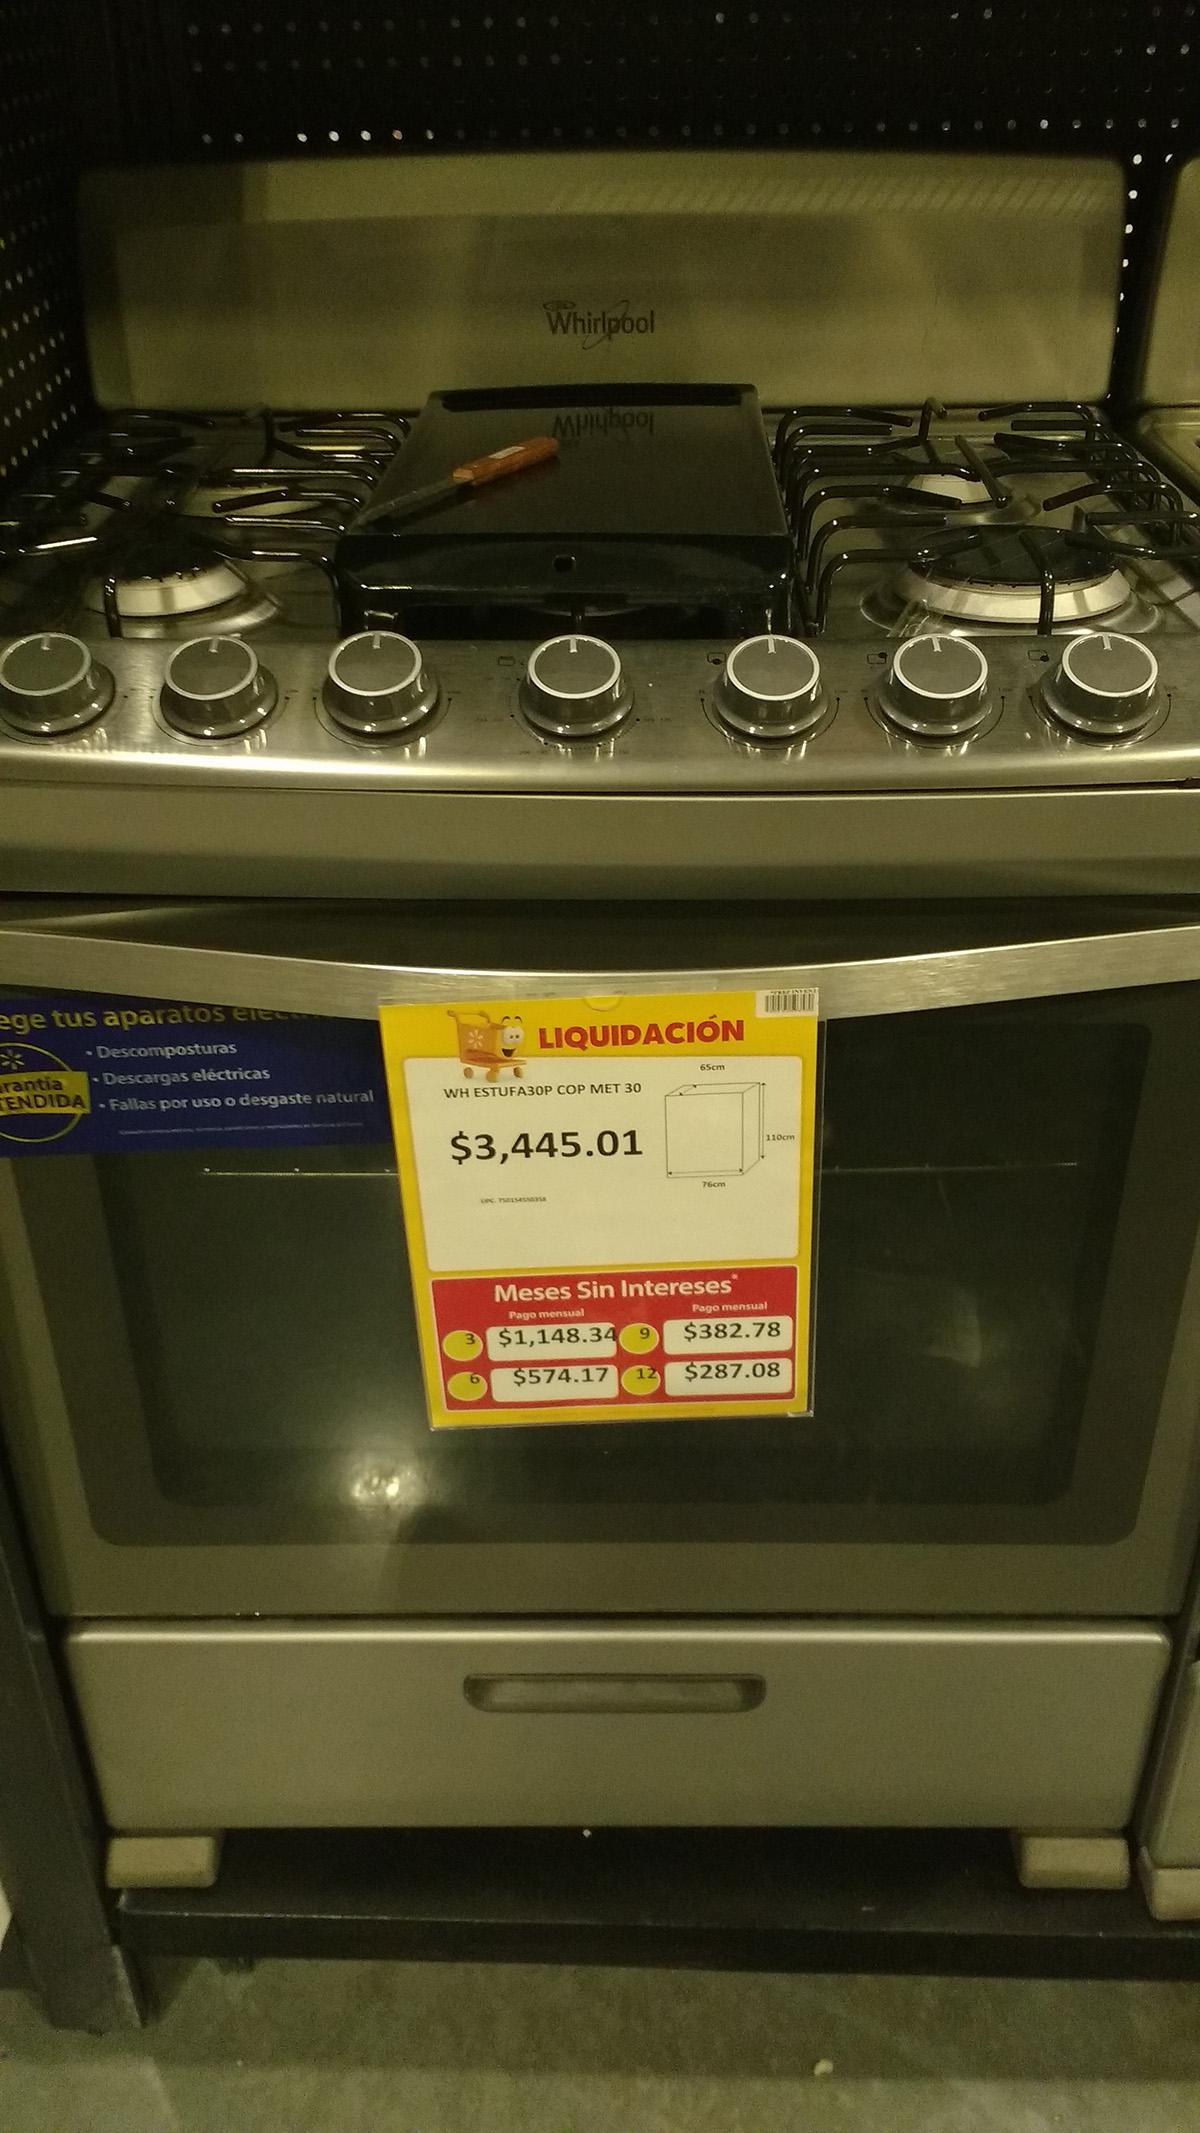 Walmart cuemanco estufa whirlpool 30 de acero inoxidable for Estufa whirlpool acero inoxidable